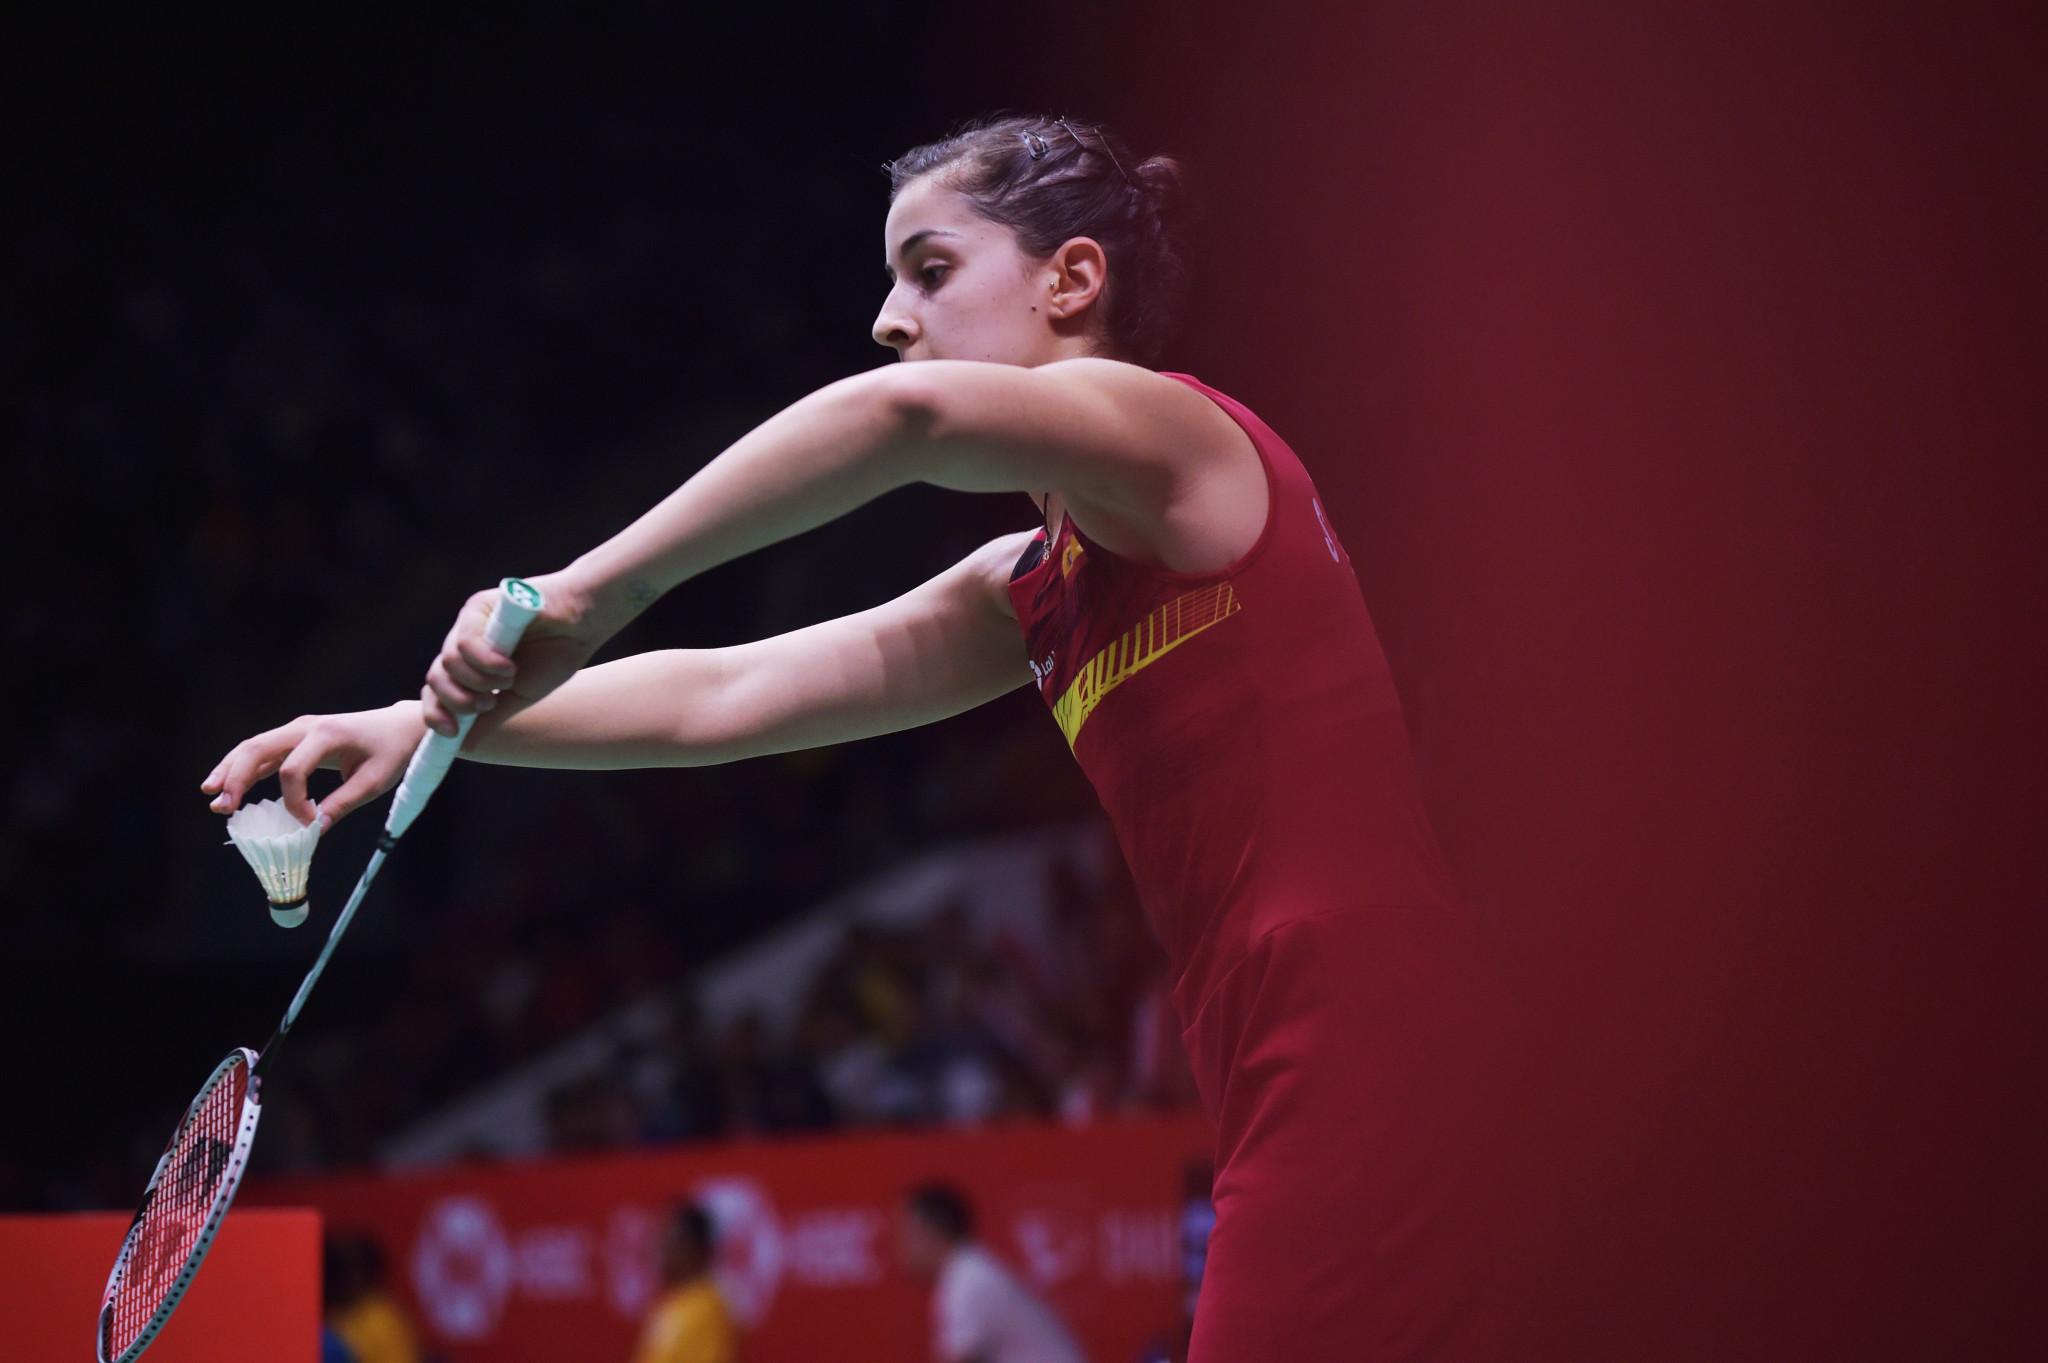 Carolina Marín, pictured, will face qualifier Mattana Hemrachatanun ©Getty Images